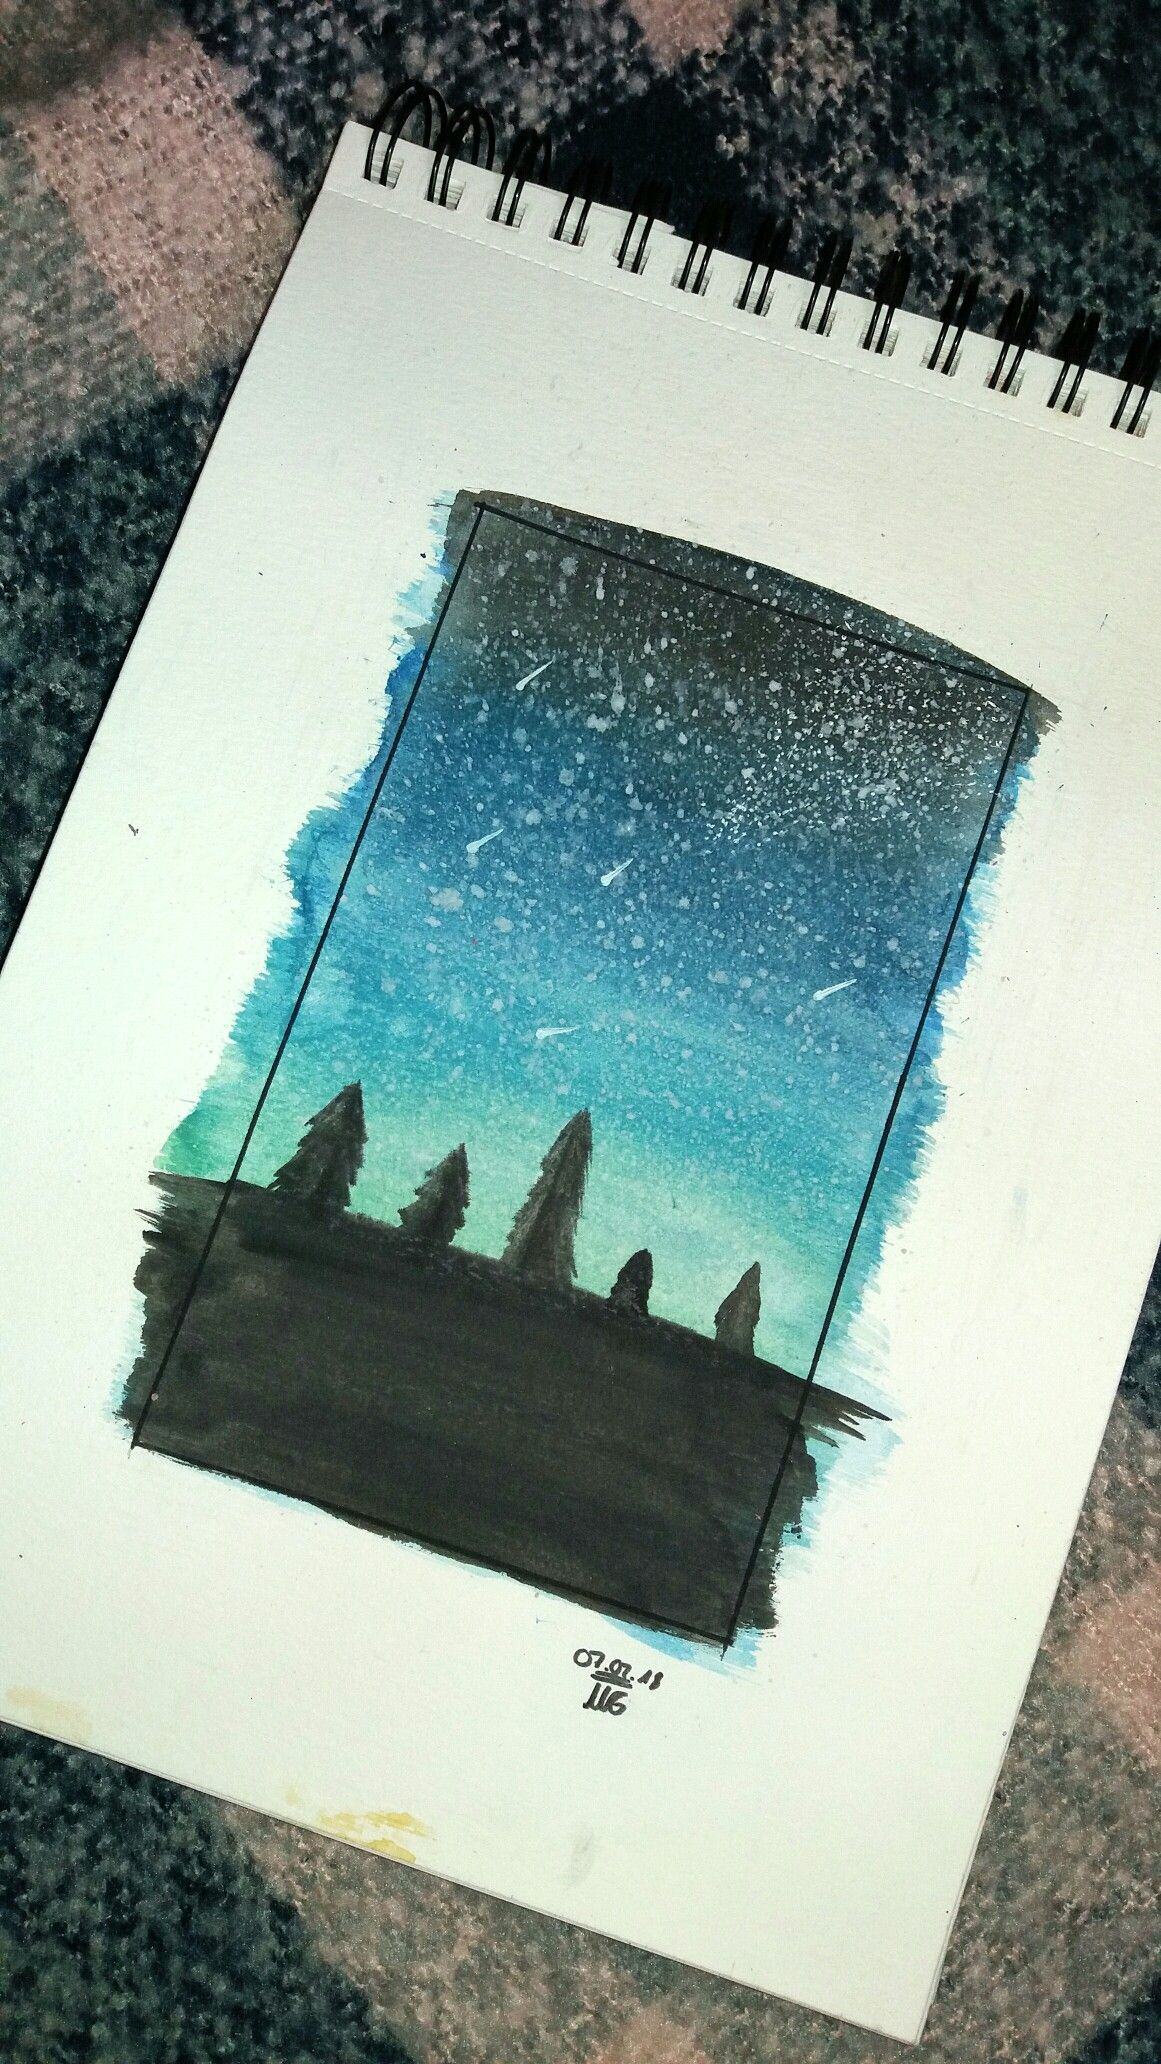 Draws Zeichnung Himmel Aquarelle Wasserfarben Bilder Aquarell Anfanger Aquarell